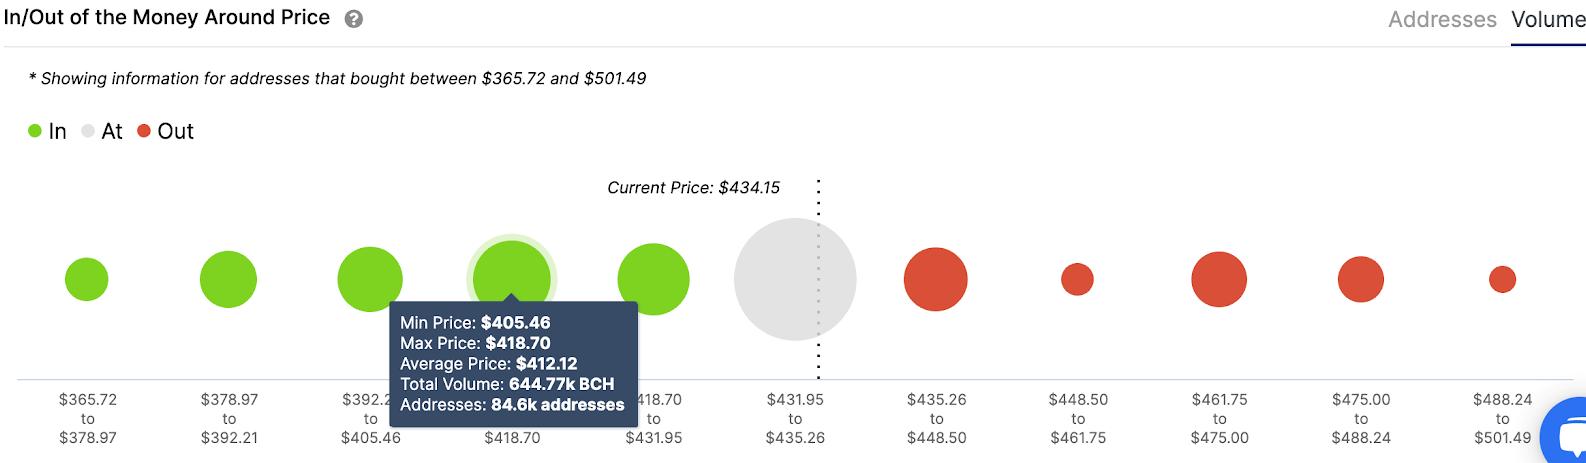 bch/usd volume chart 020421